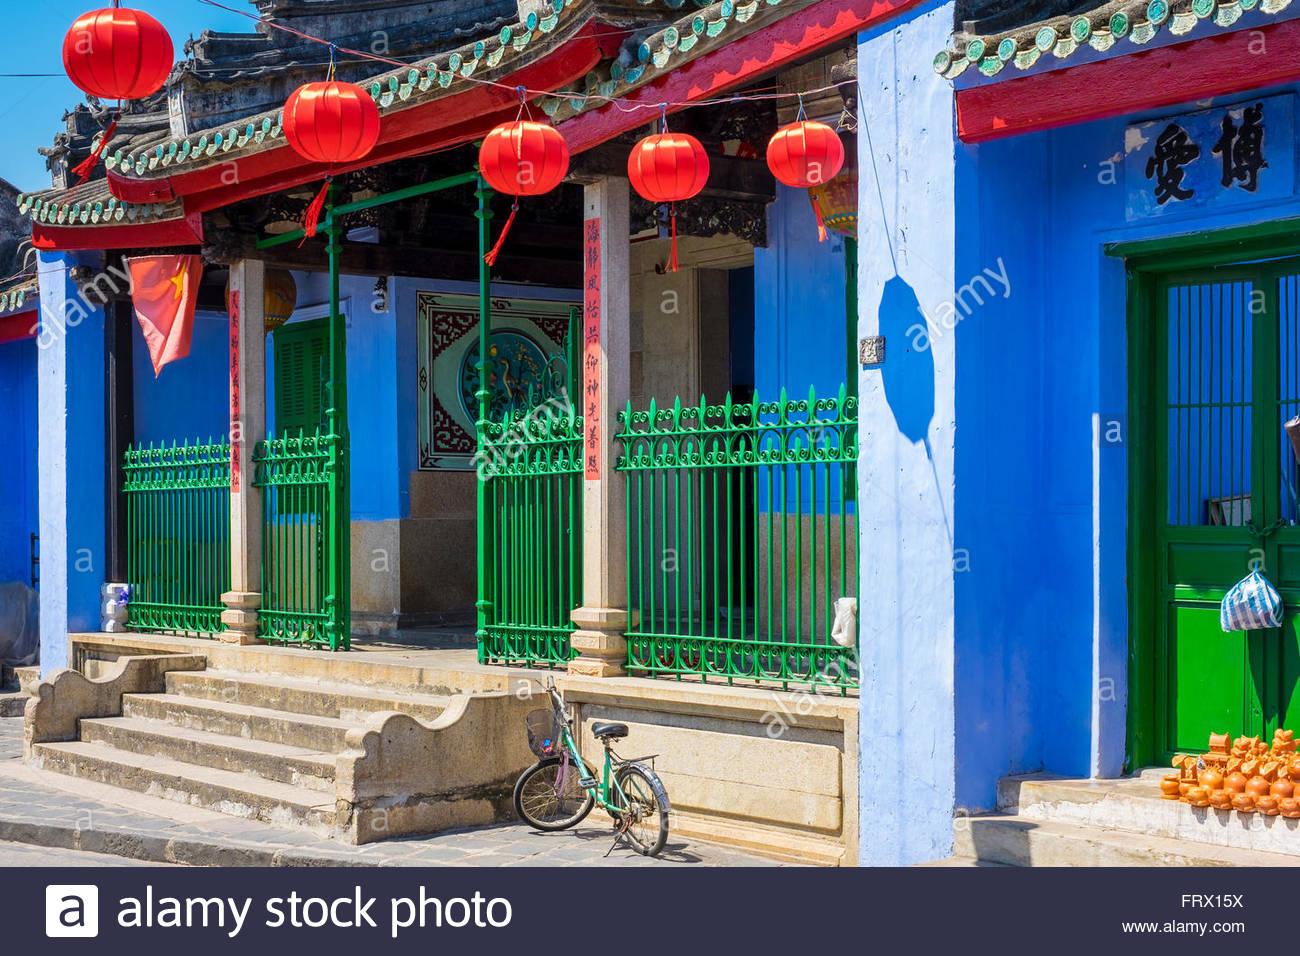 Trung Hoa Assembly Hall (Ngu Bang Assembly Hall), Hoi An, Quang Nam Province, Vietnam - Stock Image